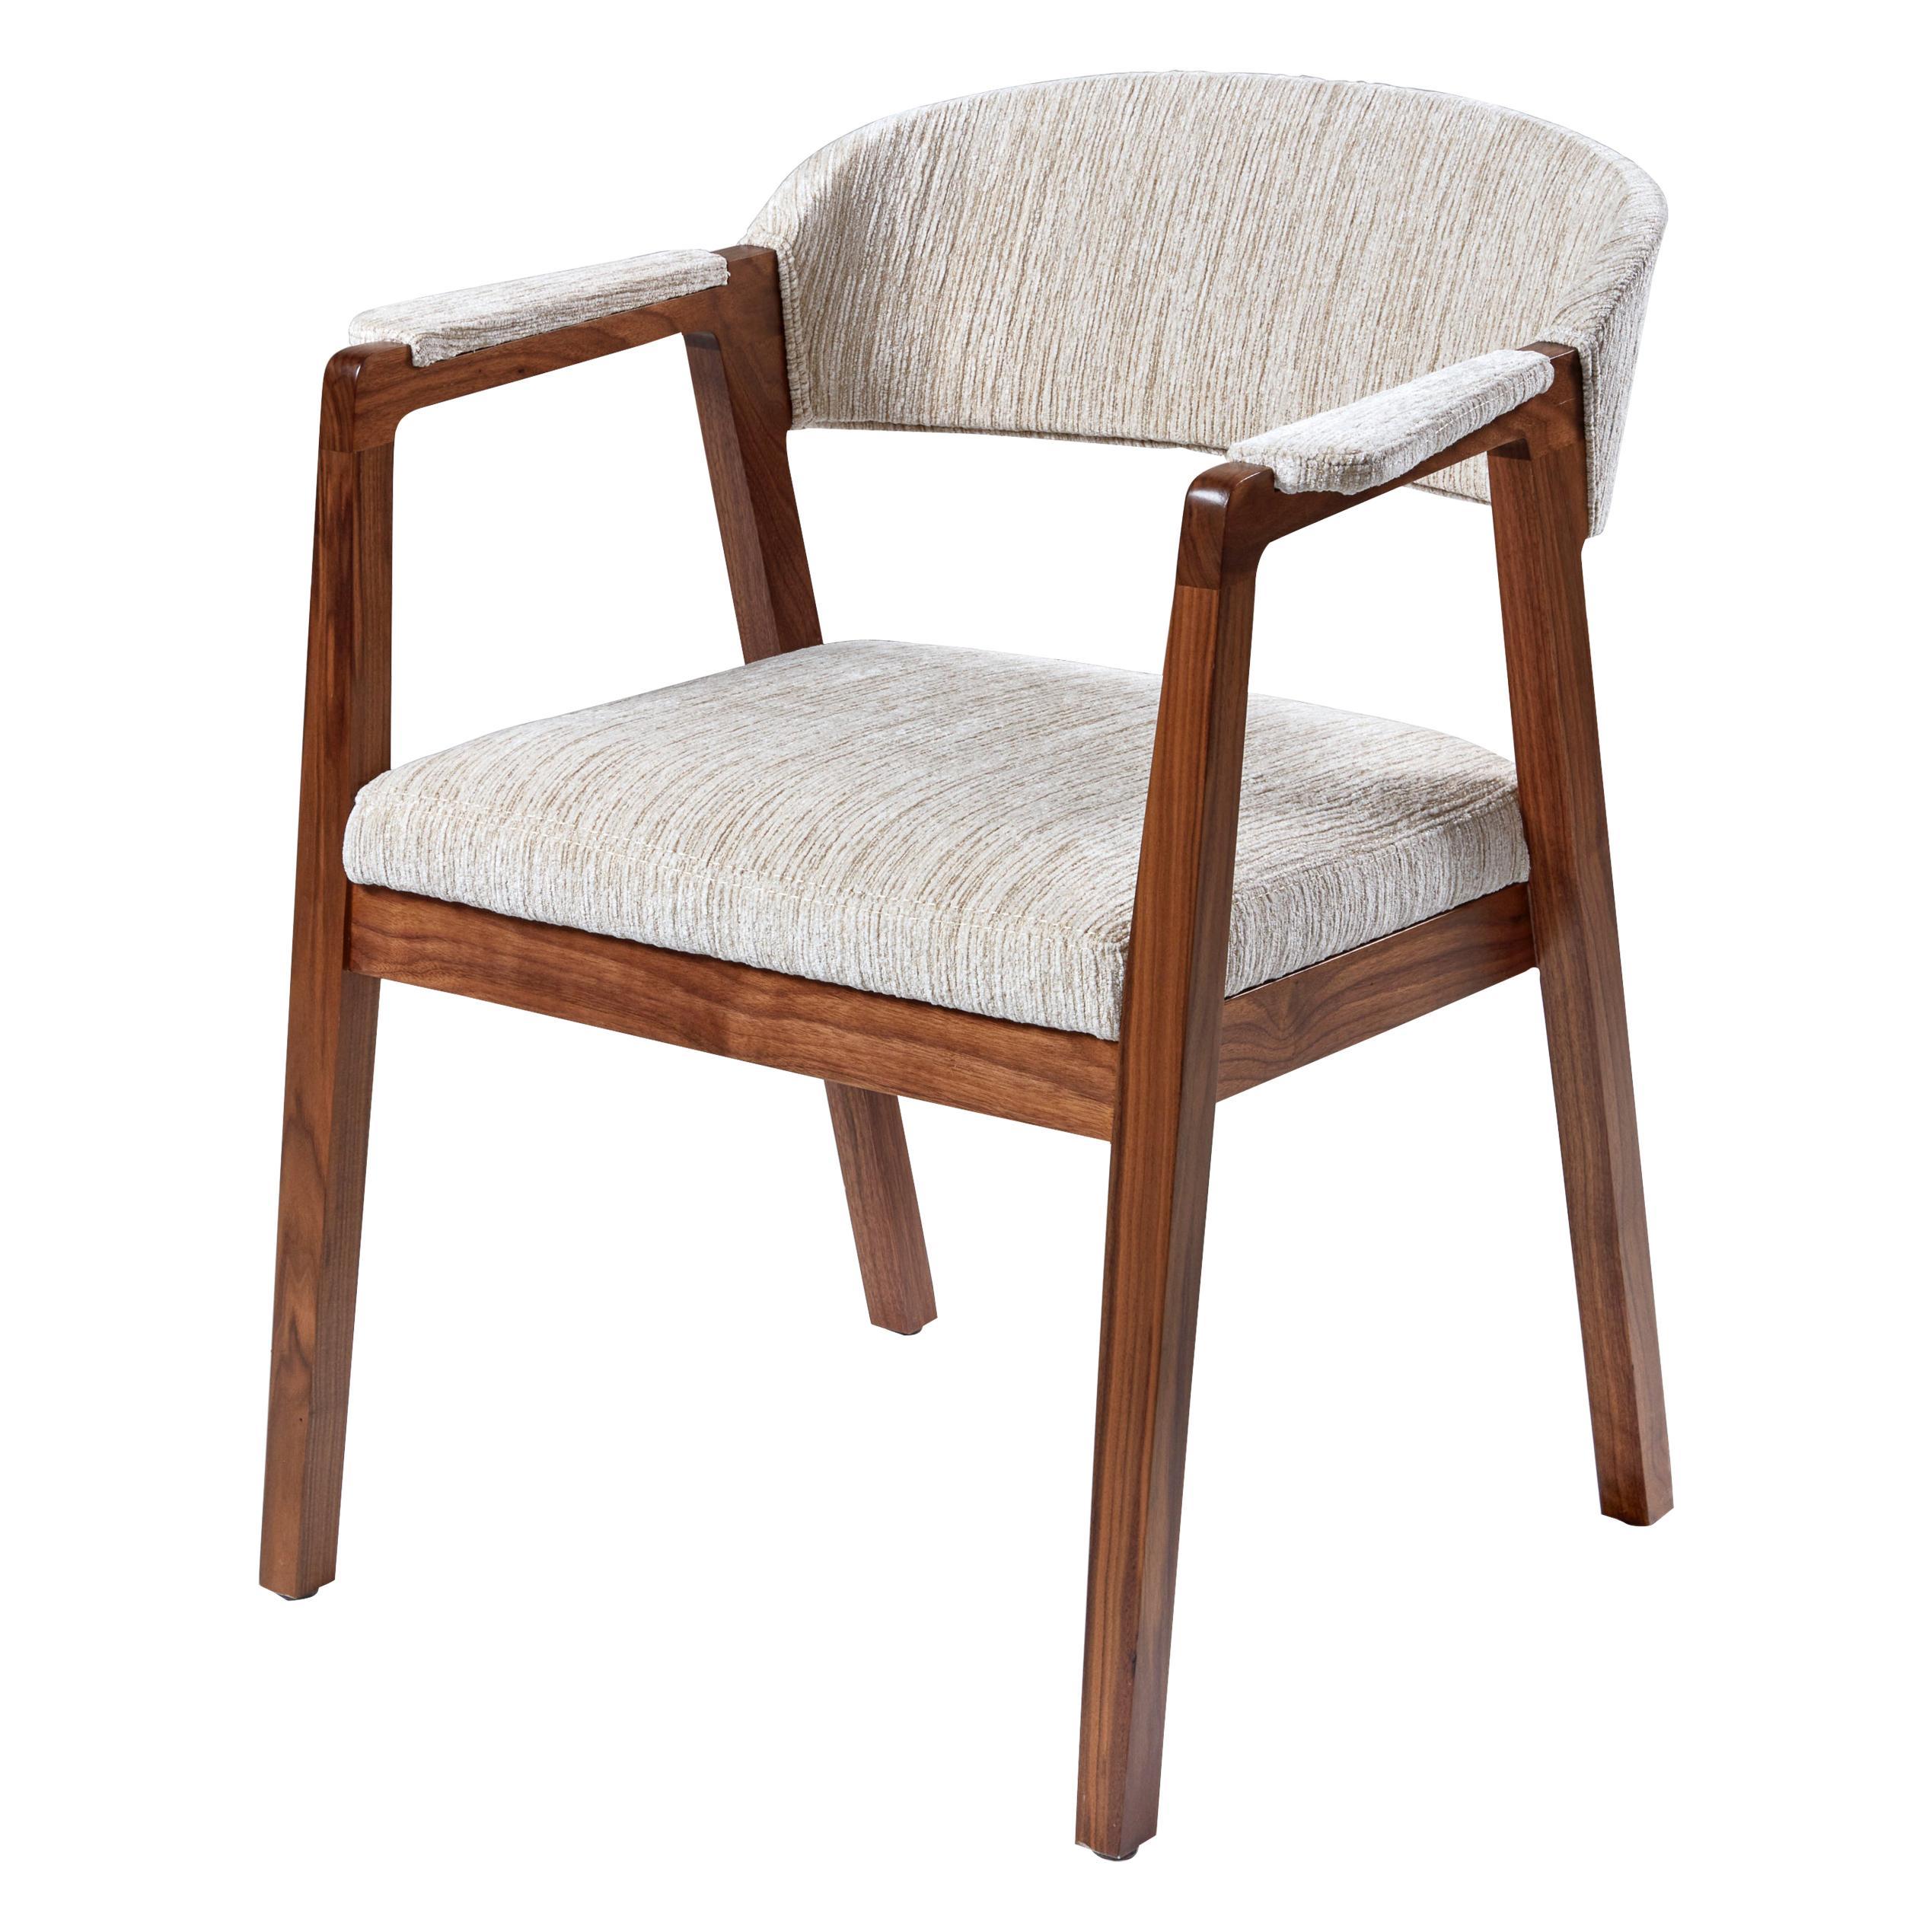 Calisto Armchair, Sleek Armed Dining Chair in Solid Walnut Wood